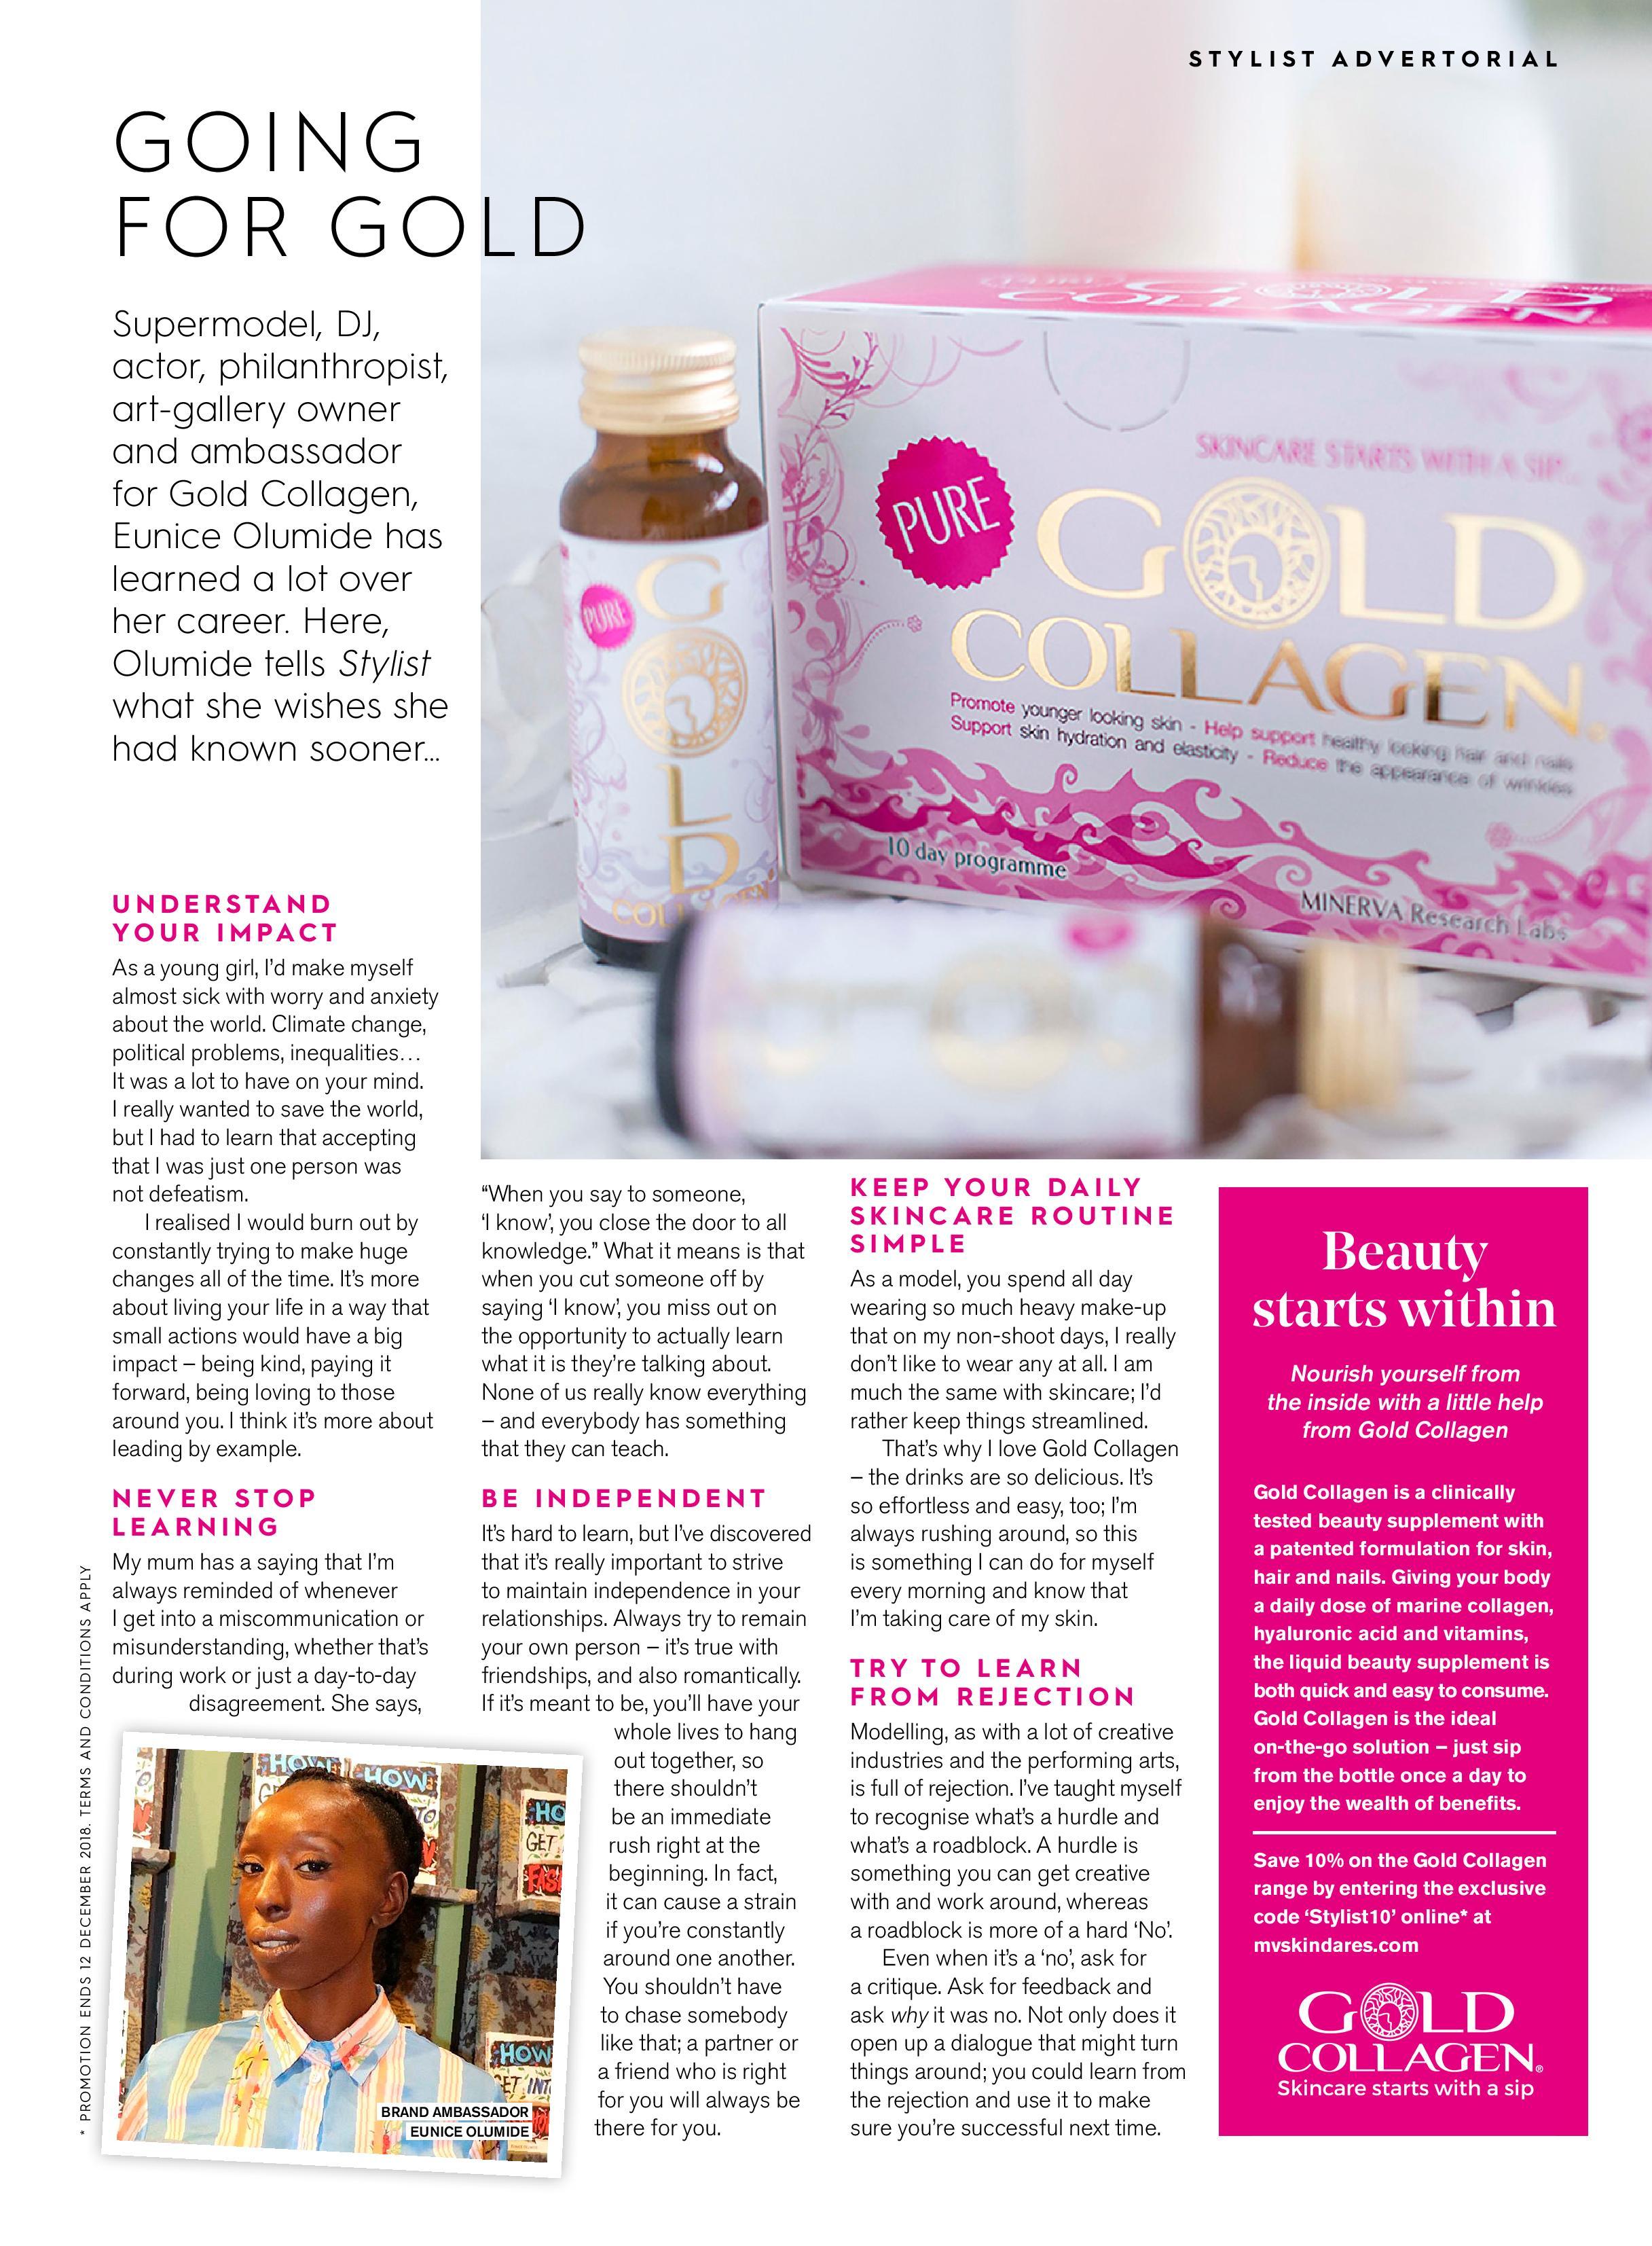 Advertorial in Stylist Magazine ft. brand ambassador Eunice Olumide